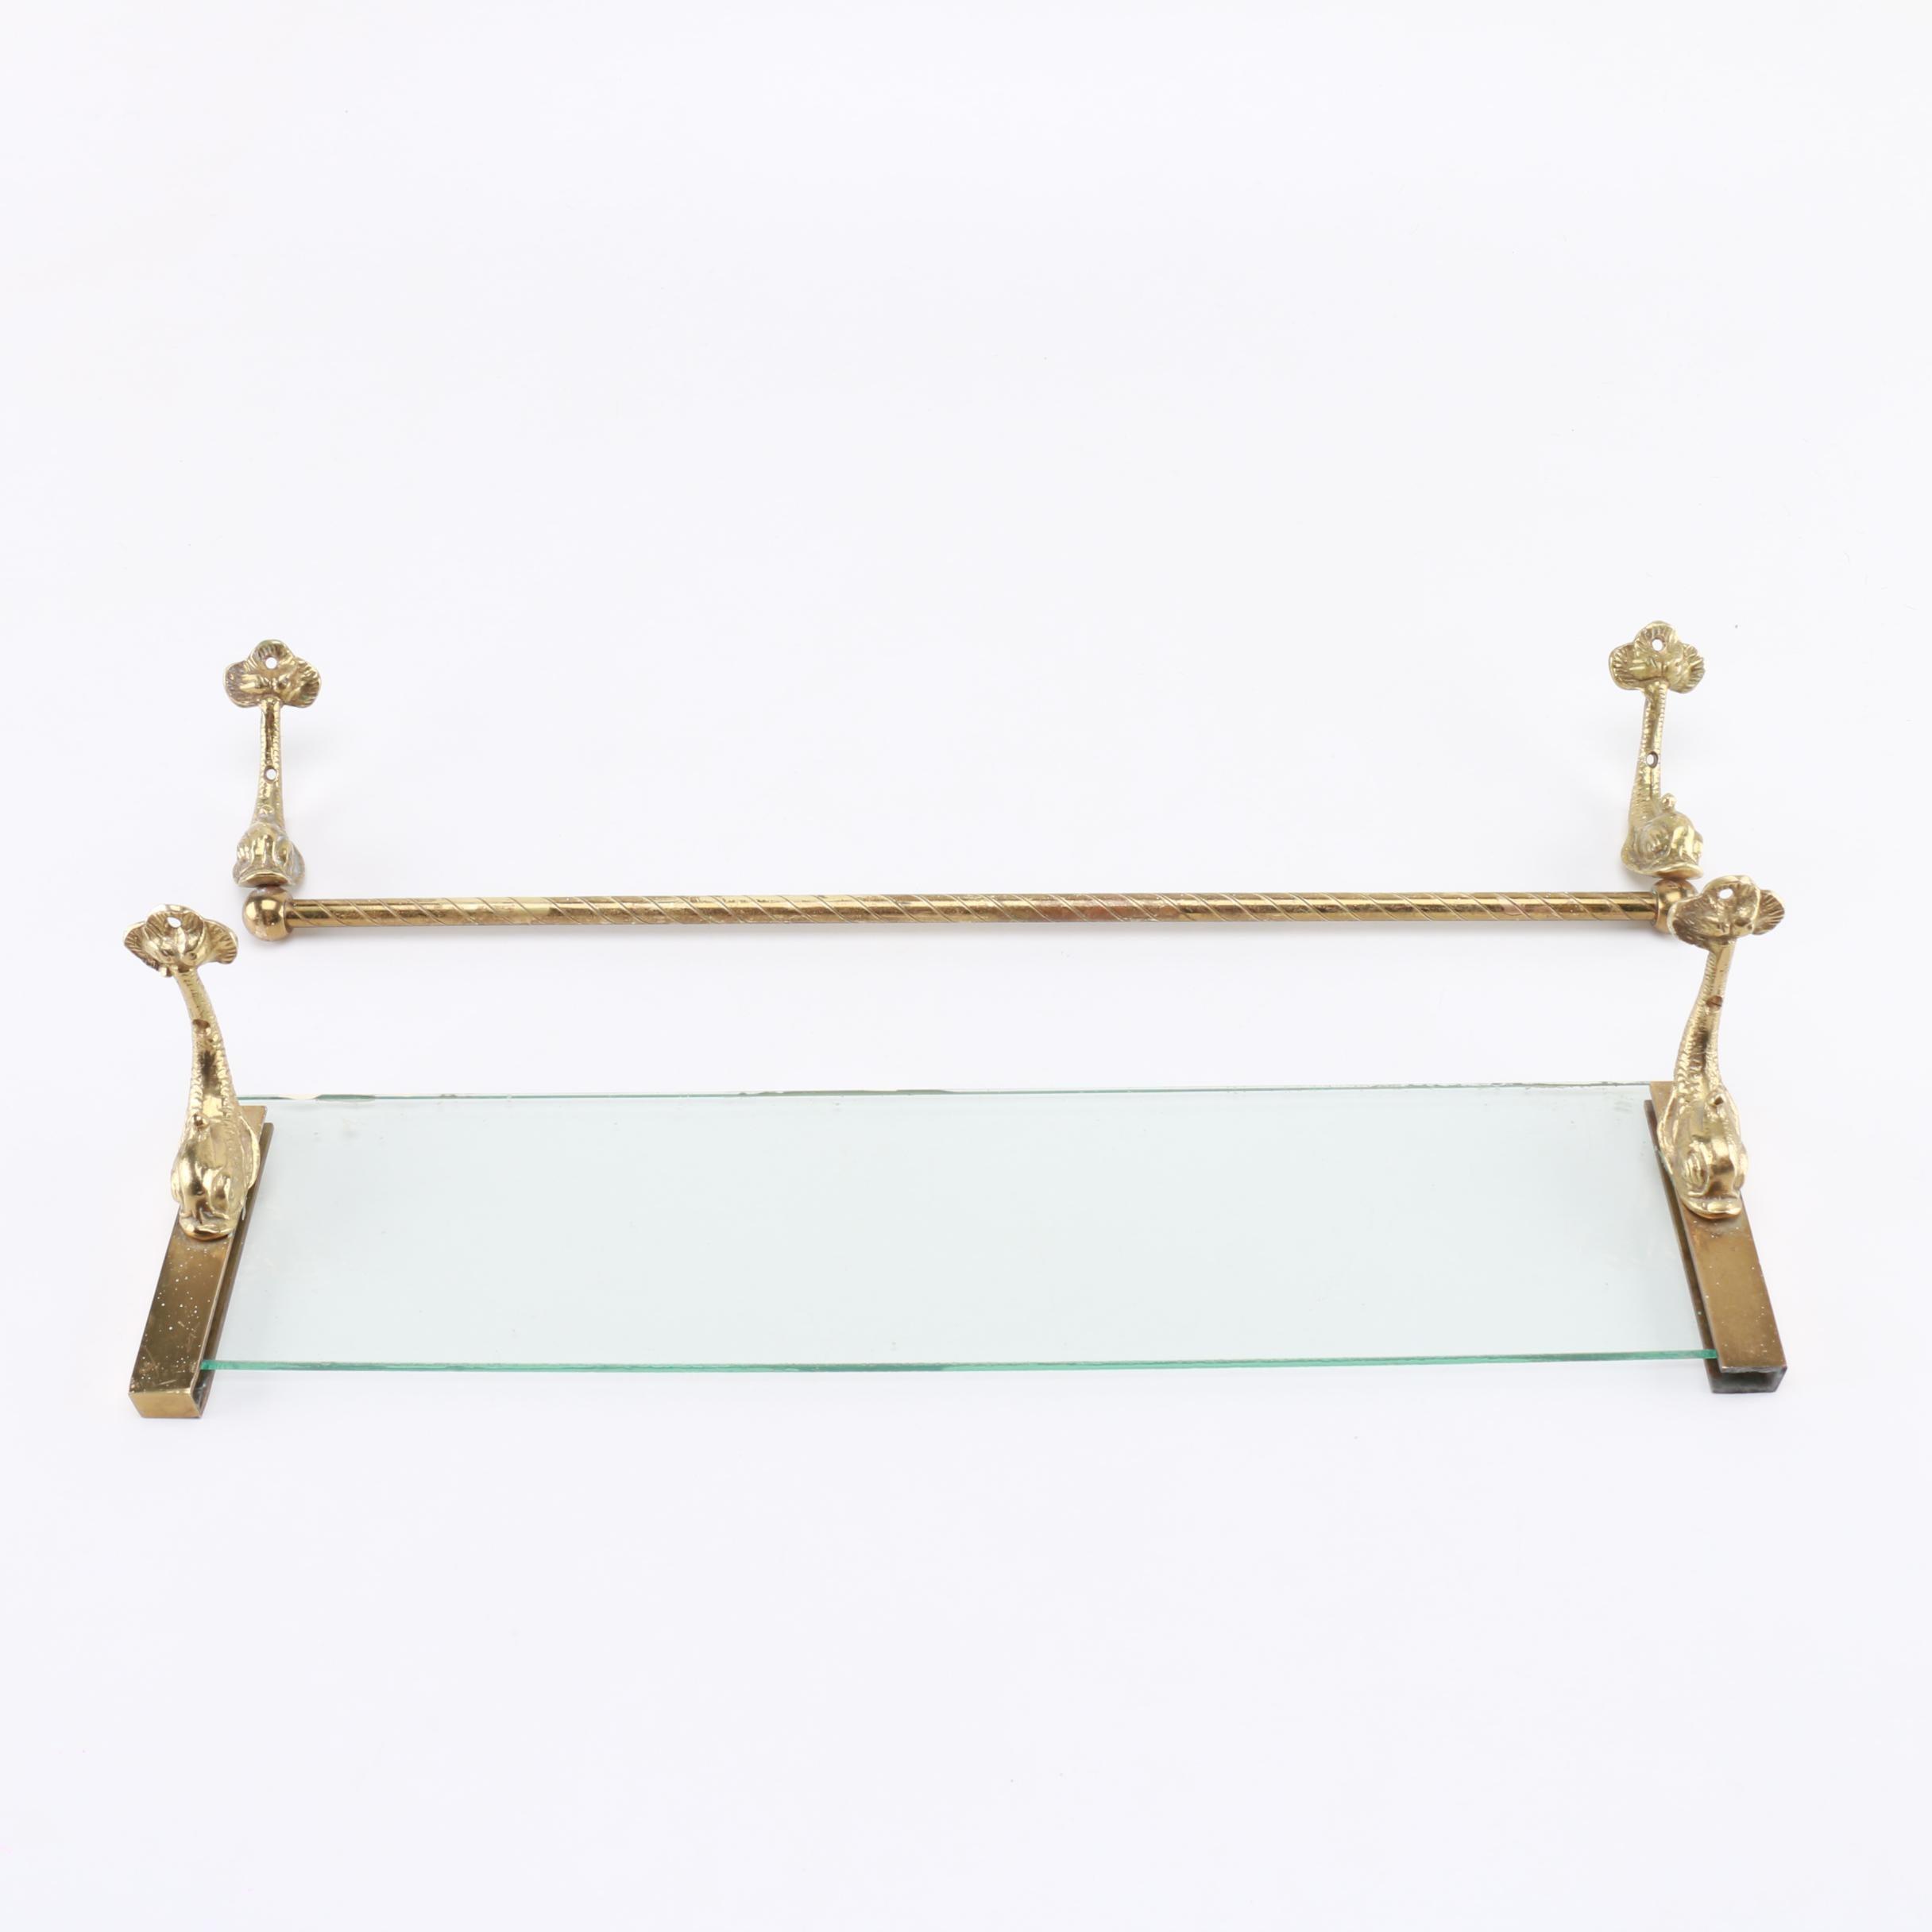 Brass Shelf And Towel Rack